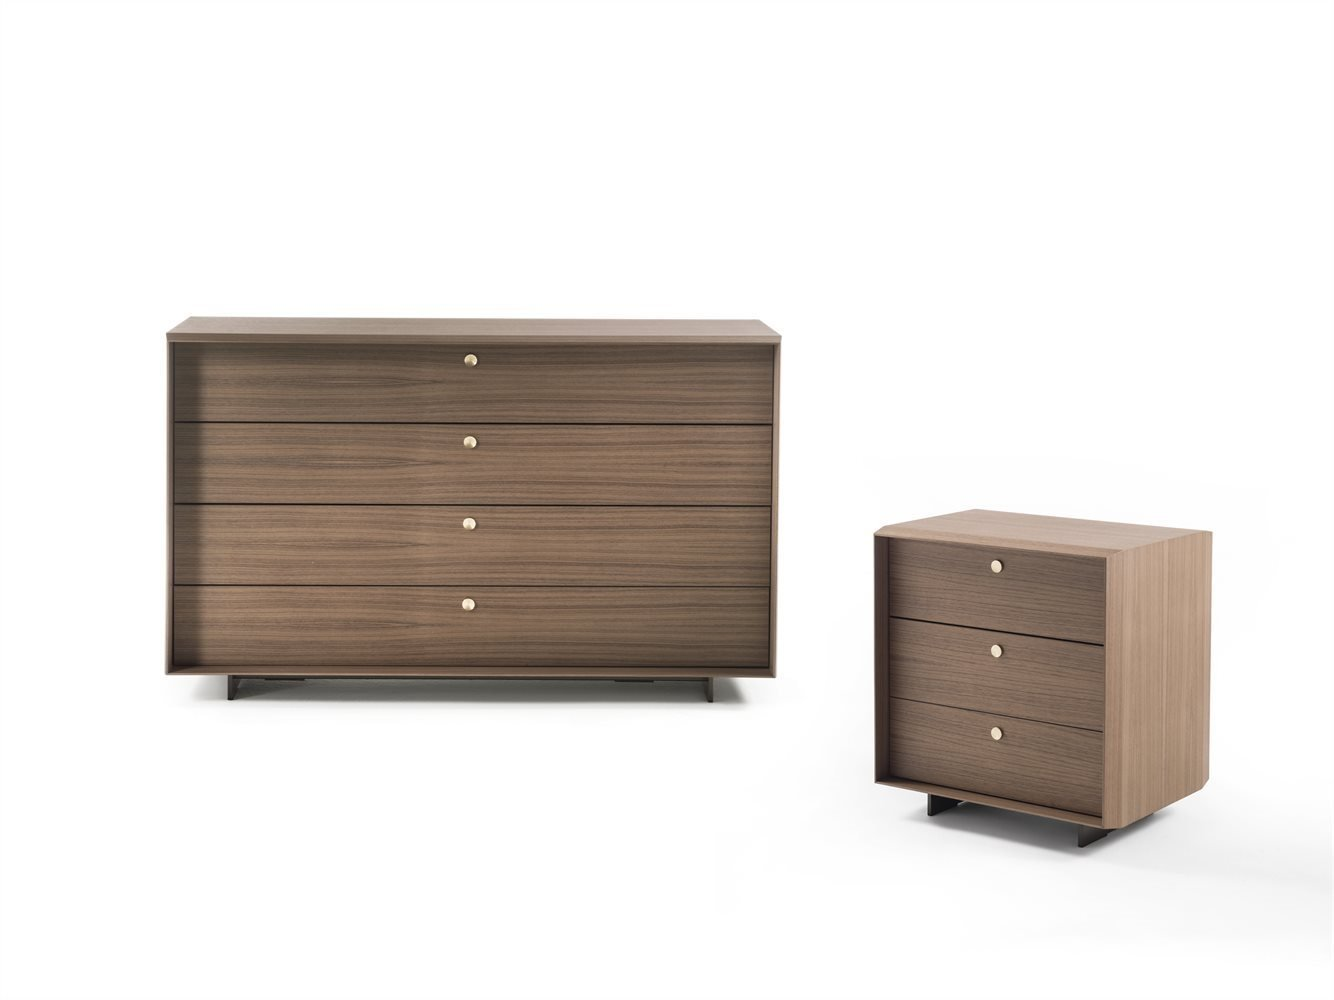 Sonja Night 2 Chest Drawer cabinet from Porada, designed by Gino Carollo